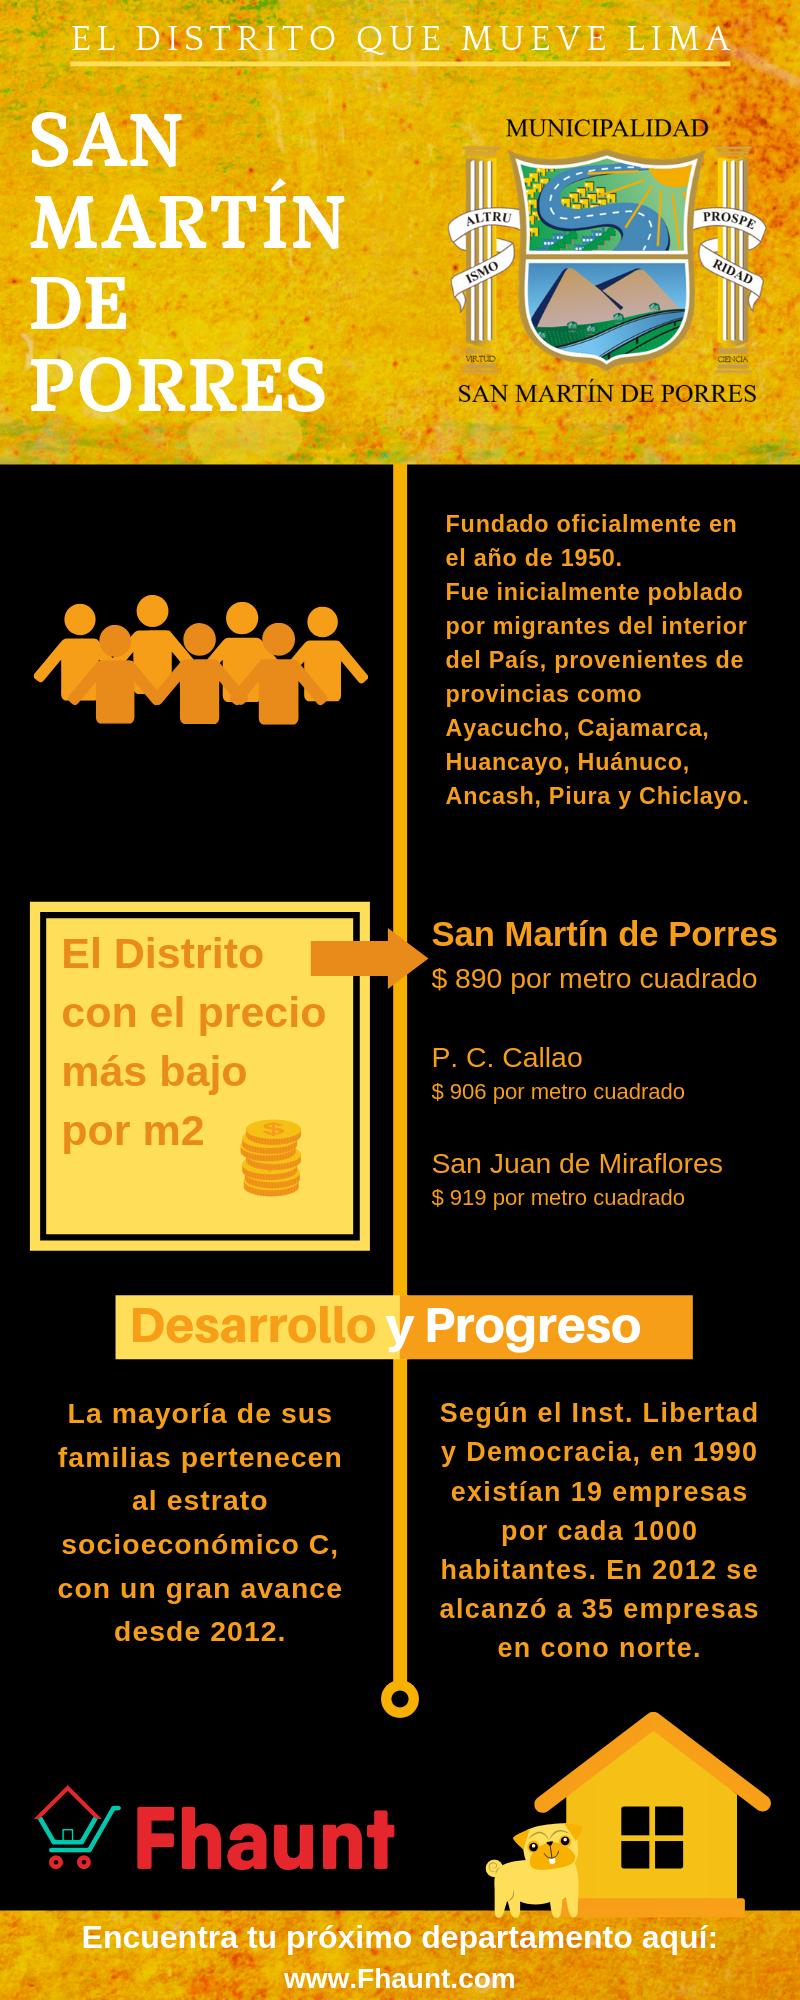 Infografía sobre Distrito de San Martín de Porres